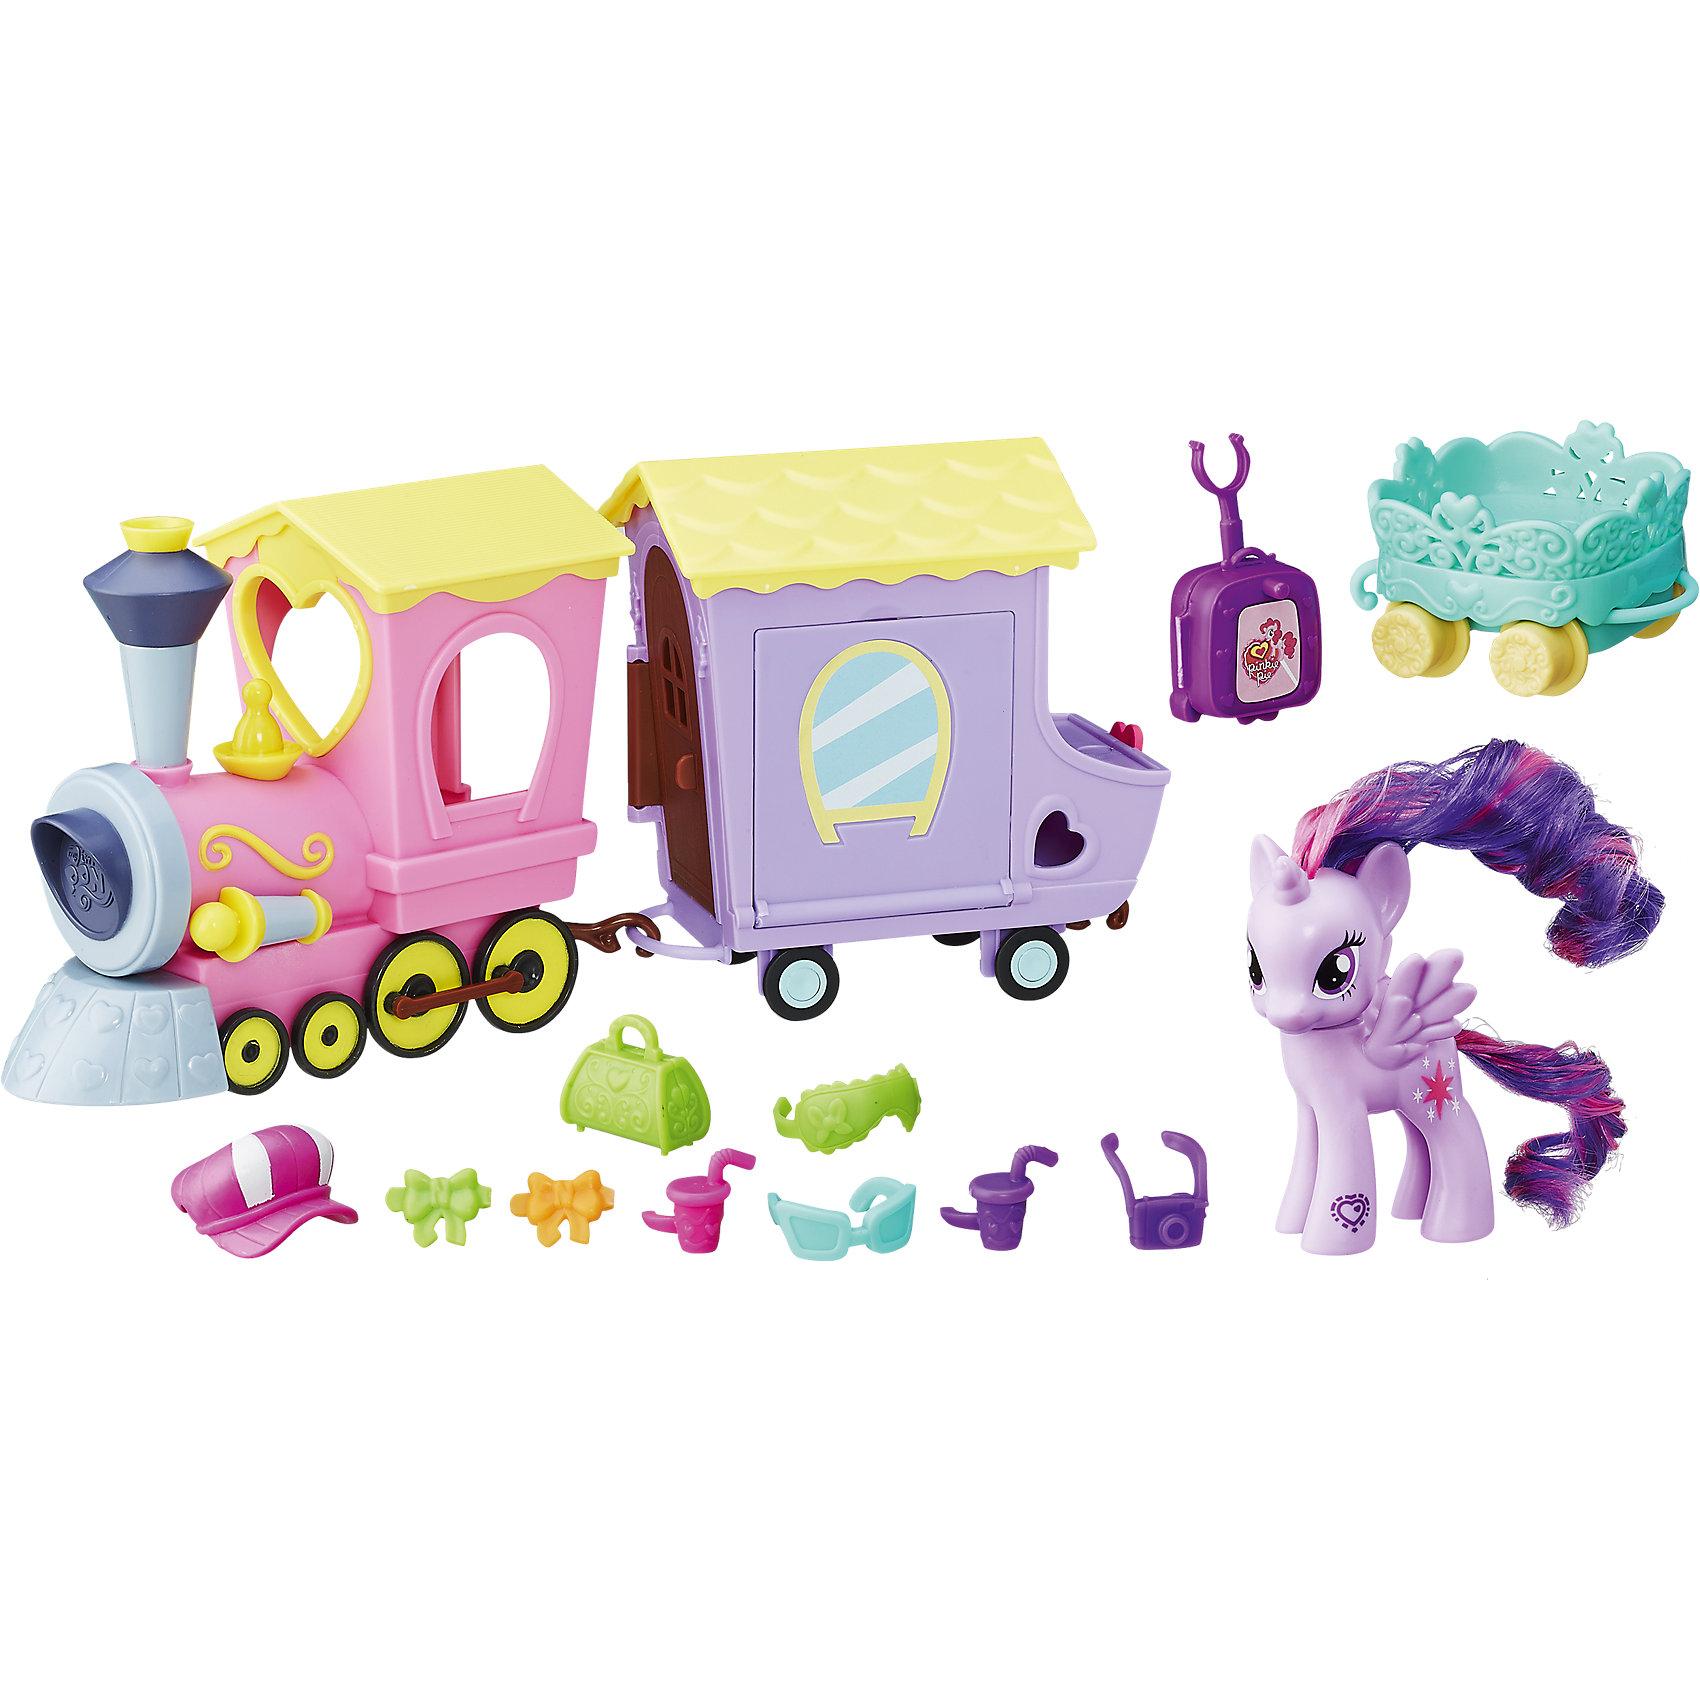 Hasbro Игровой набор Поезд Дружбы, My Little Pony hasbro hasbro my little pony игровой набор поезд дружбы